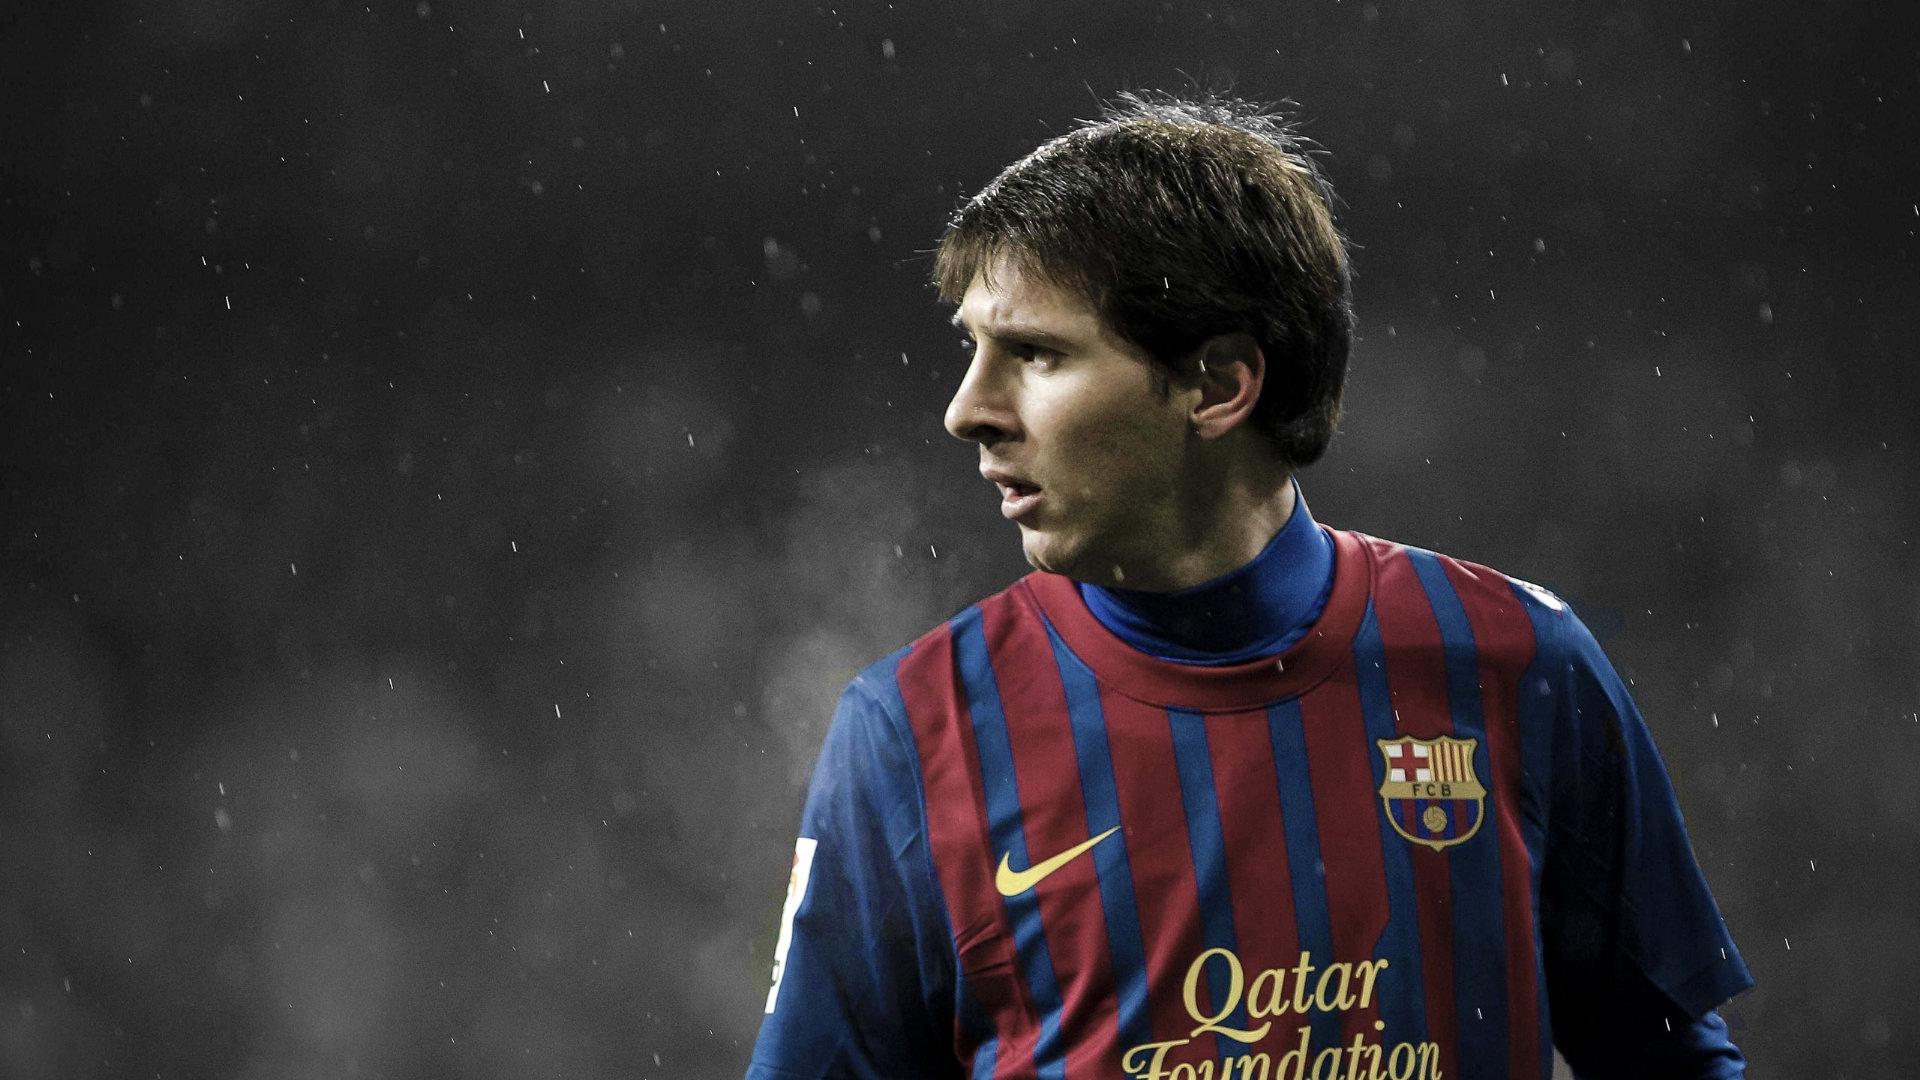 Messi Wallpapers 2014 94281 MOVDATA 1920x1080